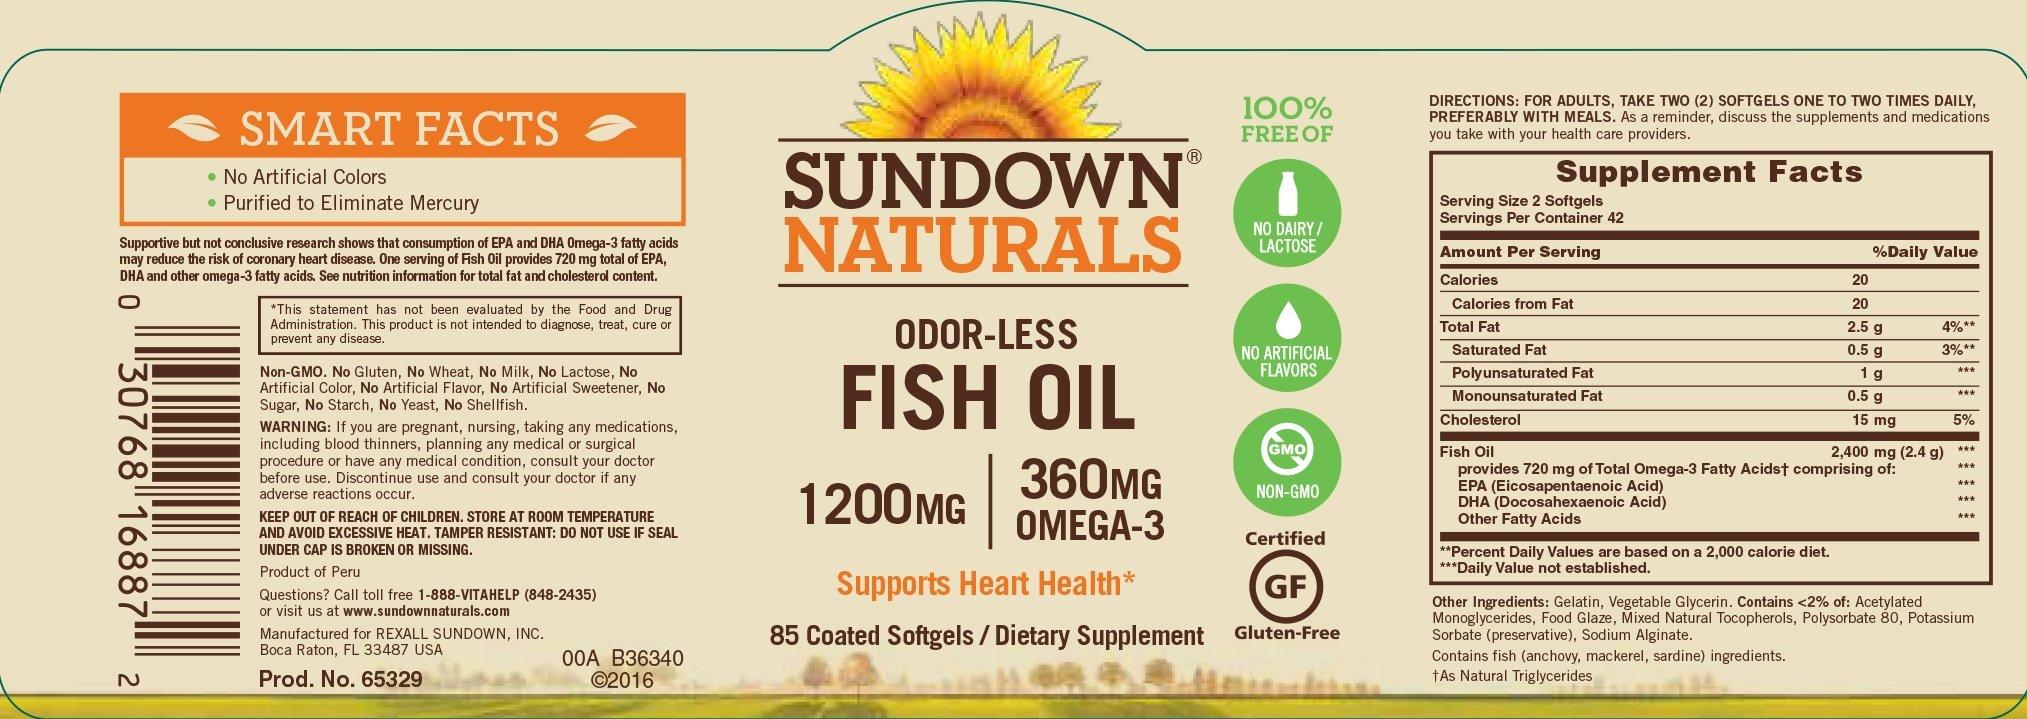 Sundown Naturals Odor-Less Fish Oil 1200mg, 85 Softgels Each(Pack of 12)